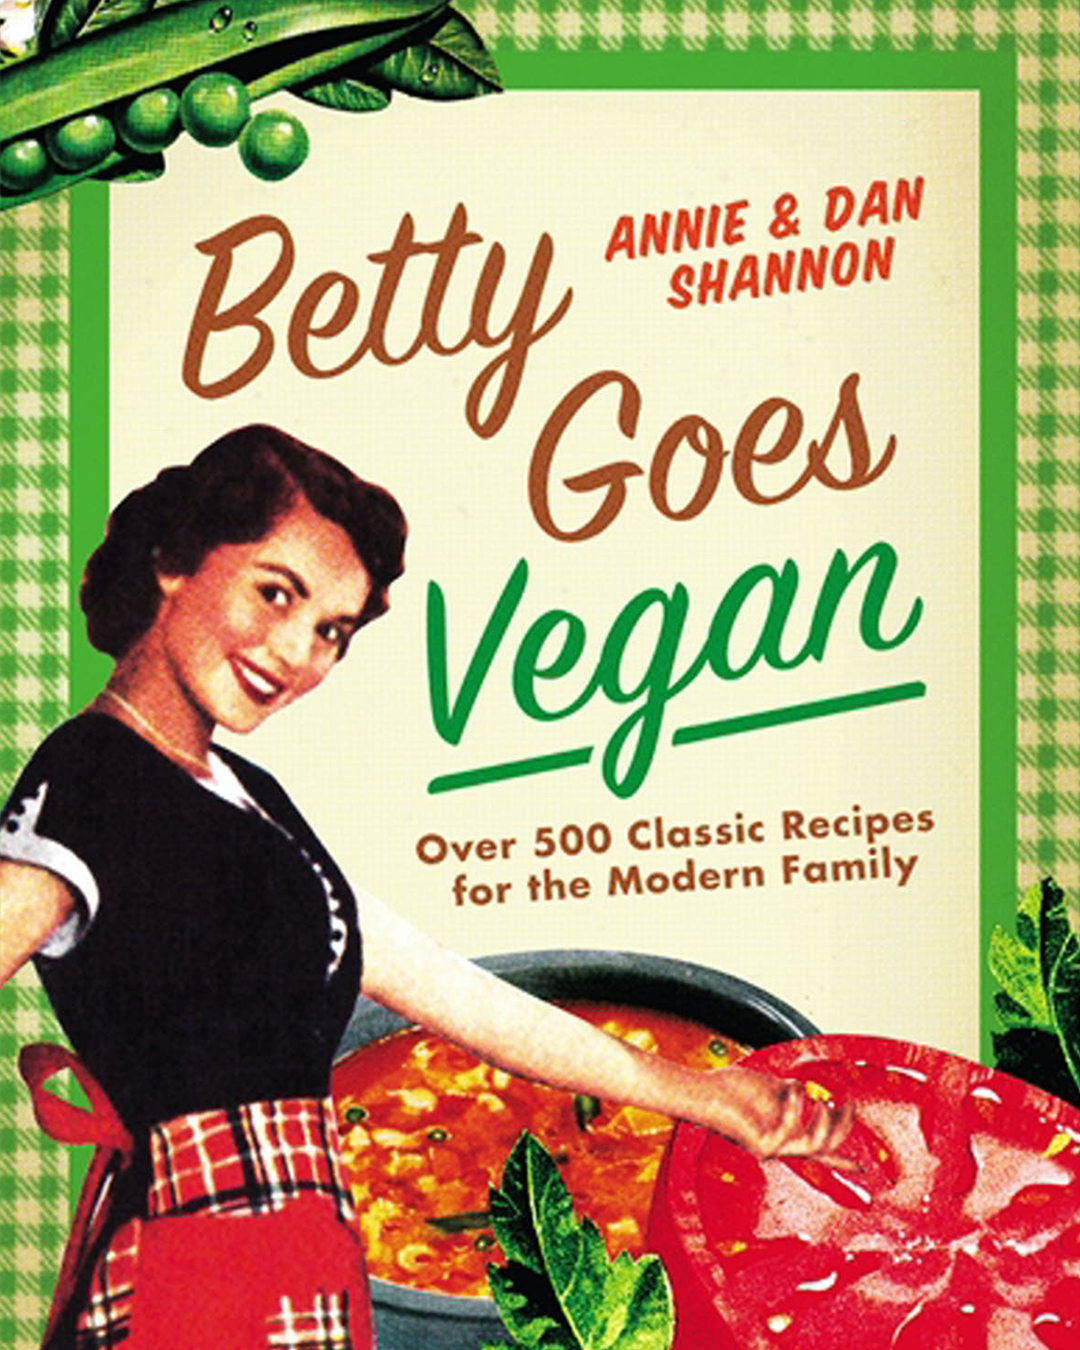 Betty Goes Vegan Cookbook Cover